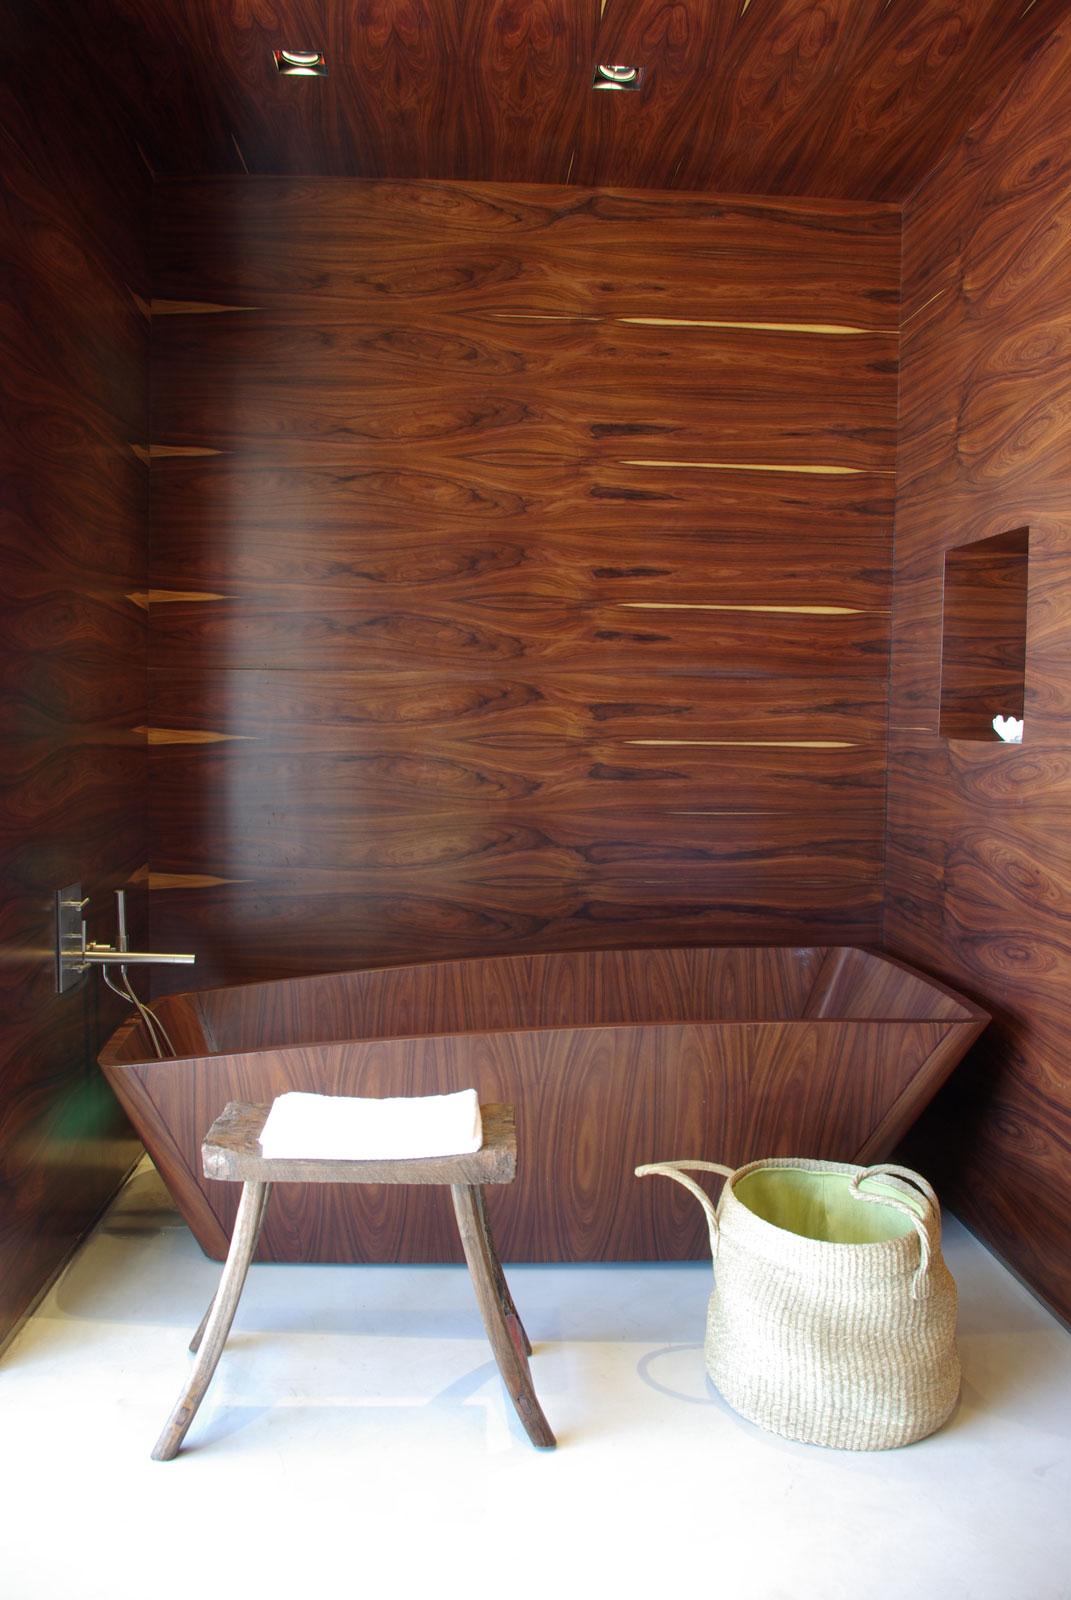 Estancia-Vik-Jose-Ignacio-Master-Suite-Wood-Bathtub-at-IDEASGN.jpg